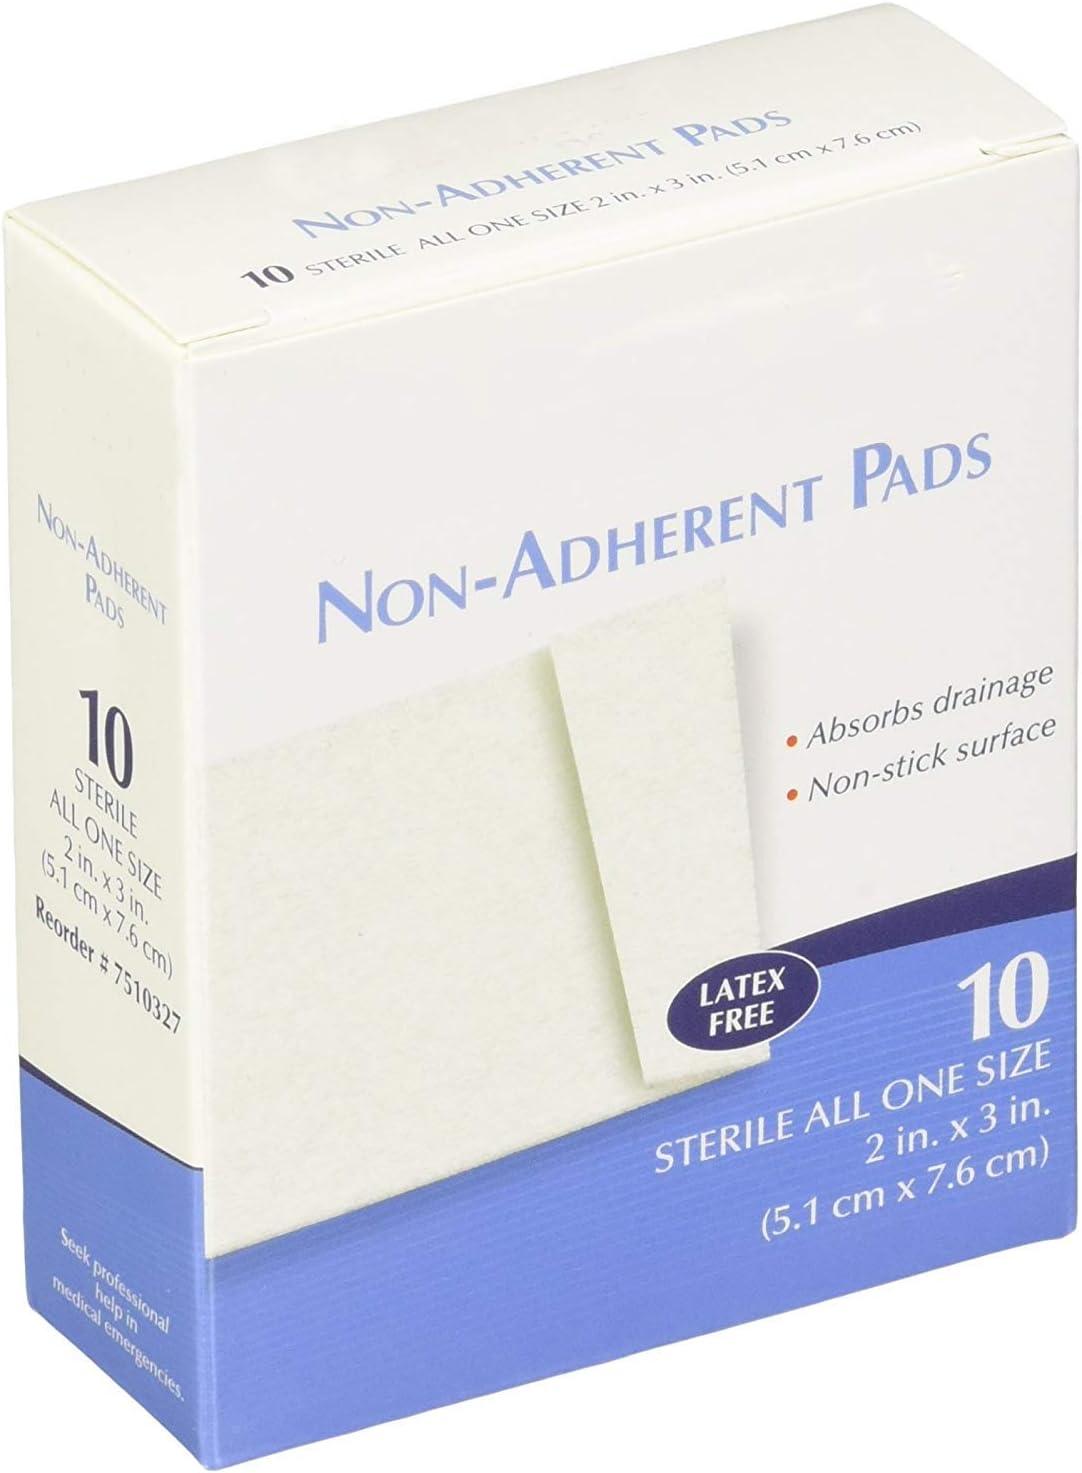 Non-Adherent Pads 2